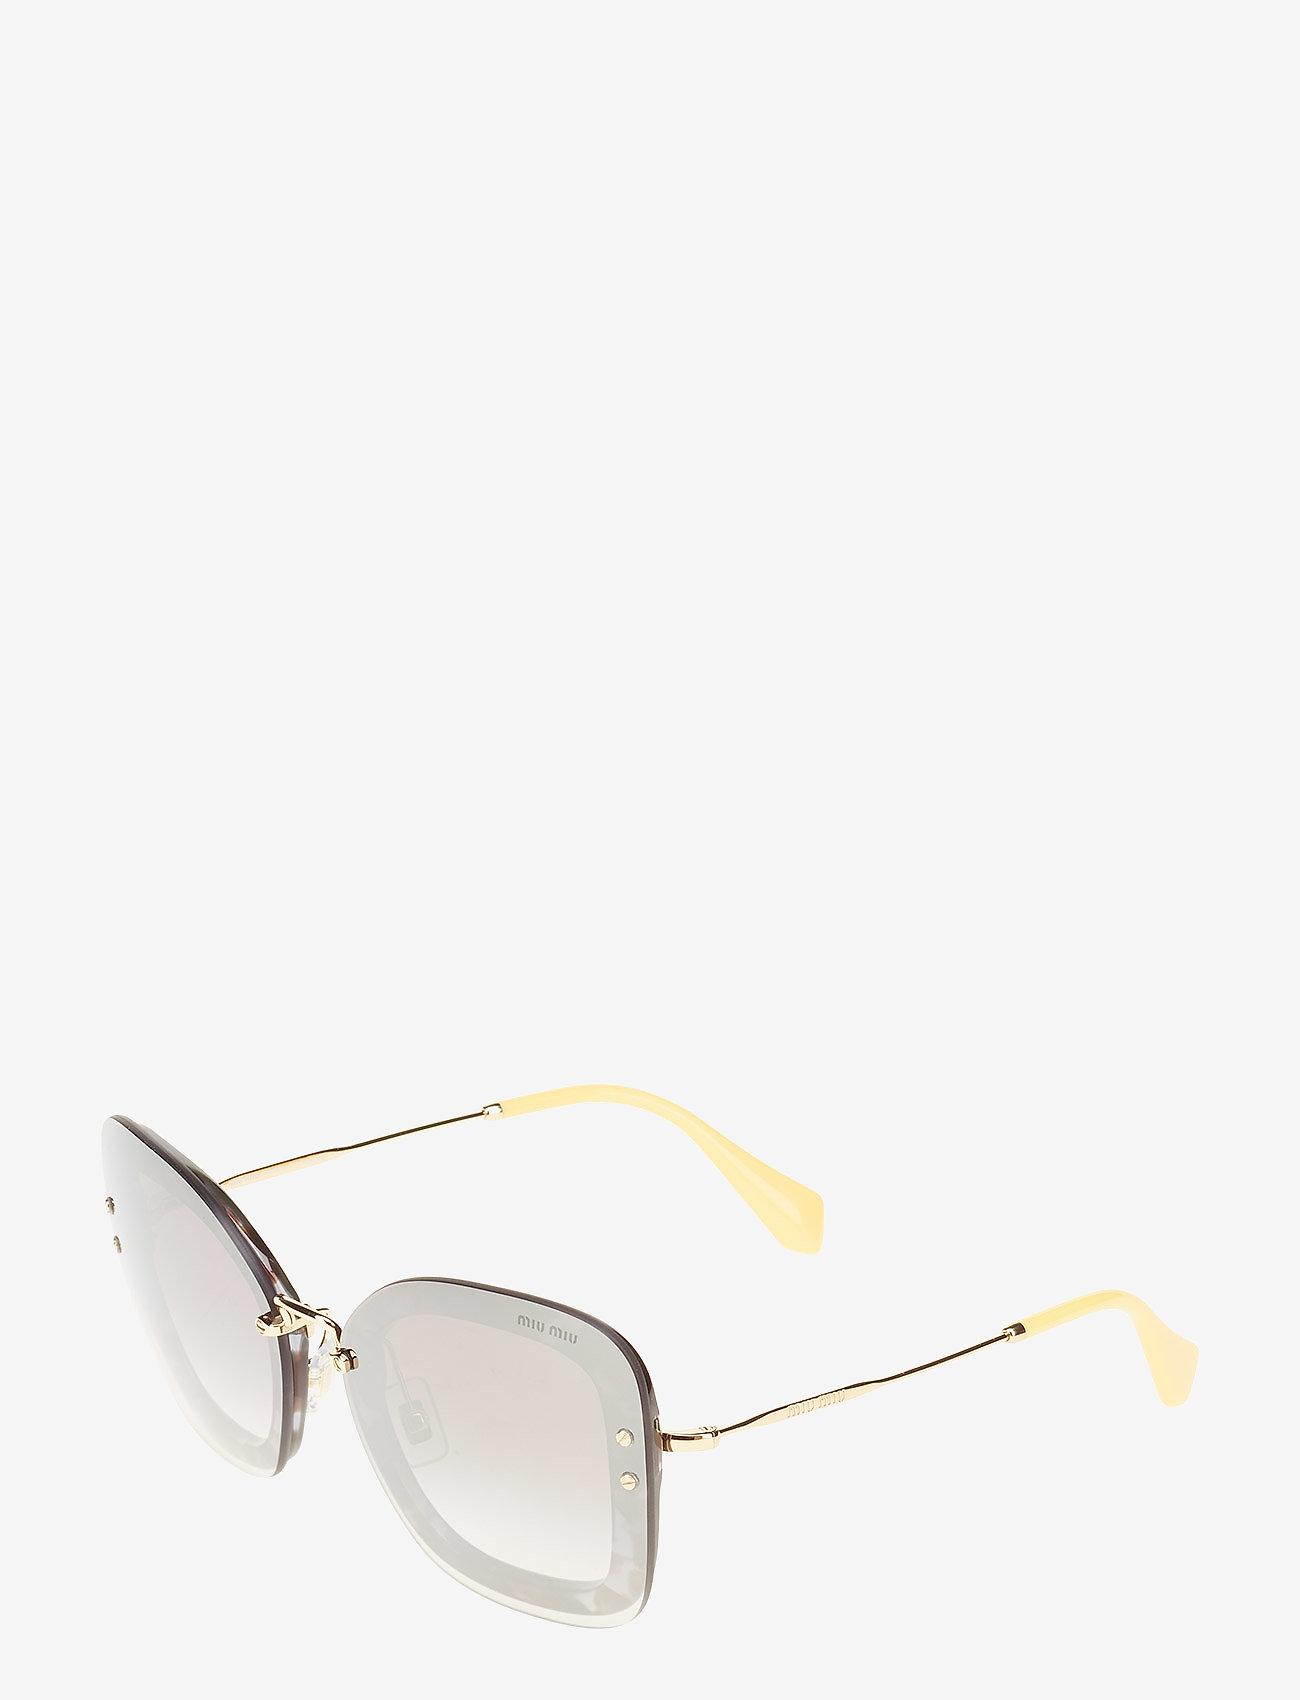 Miu Miu Sunglasses - 0MU 02TS - neliökehys - lilac havana